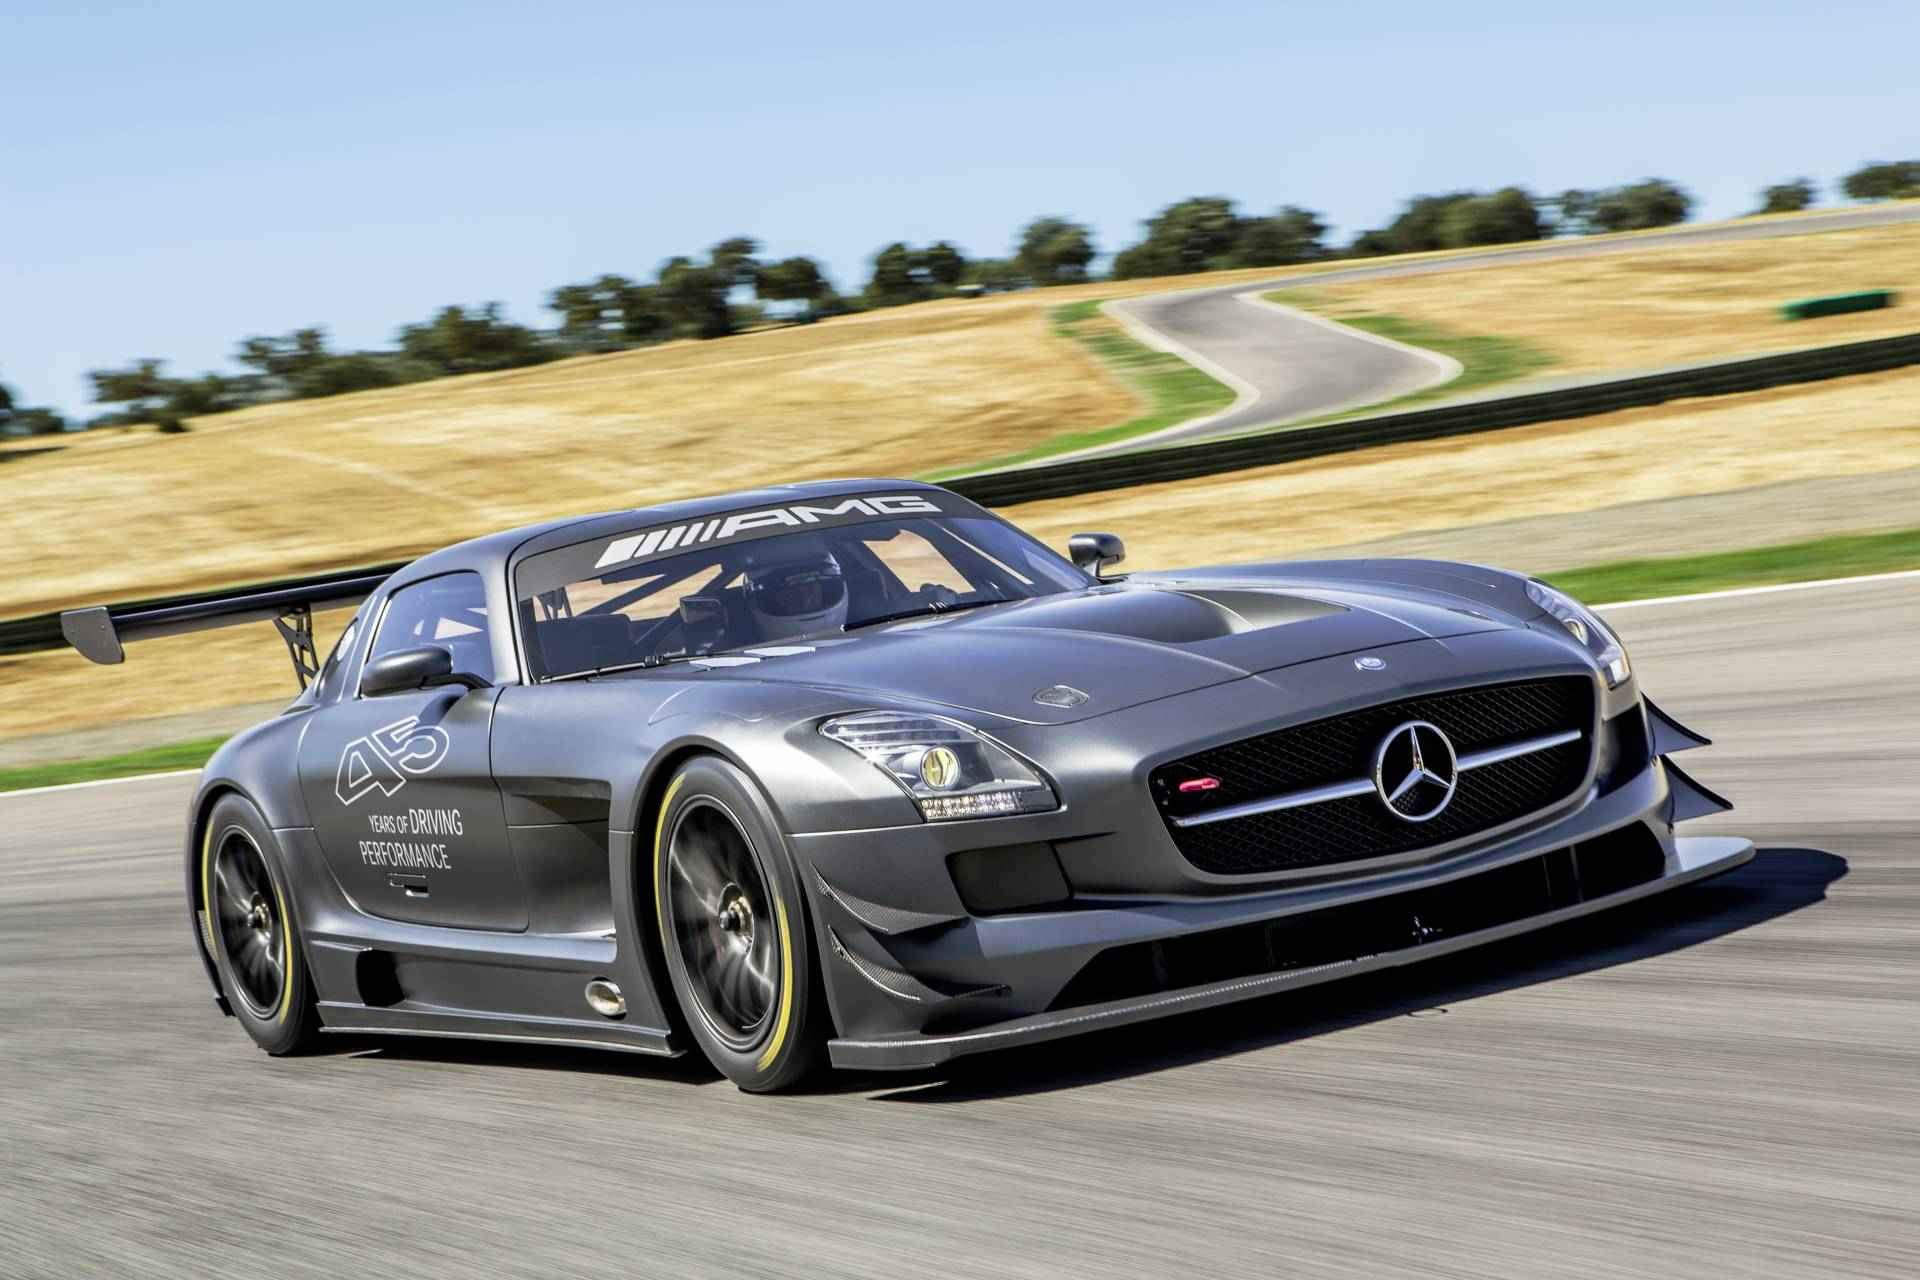 Mercedes-SLS-AMG-GT3-45th-Annv-2013-008